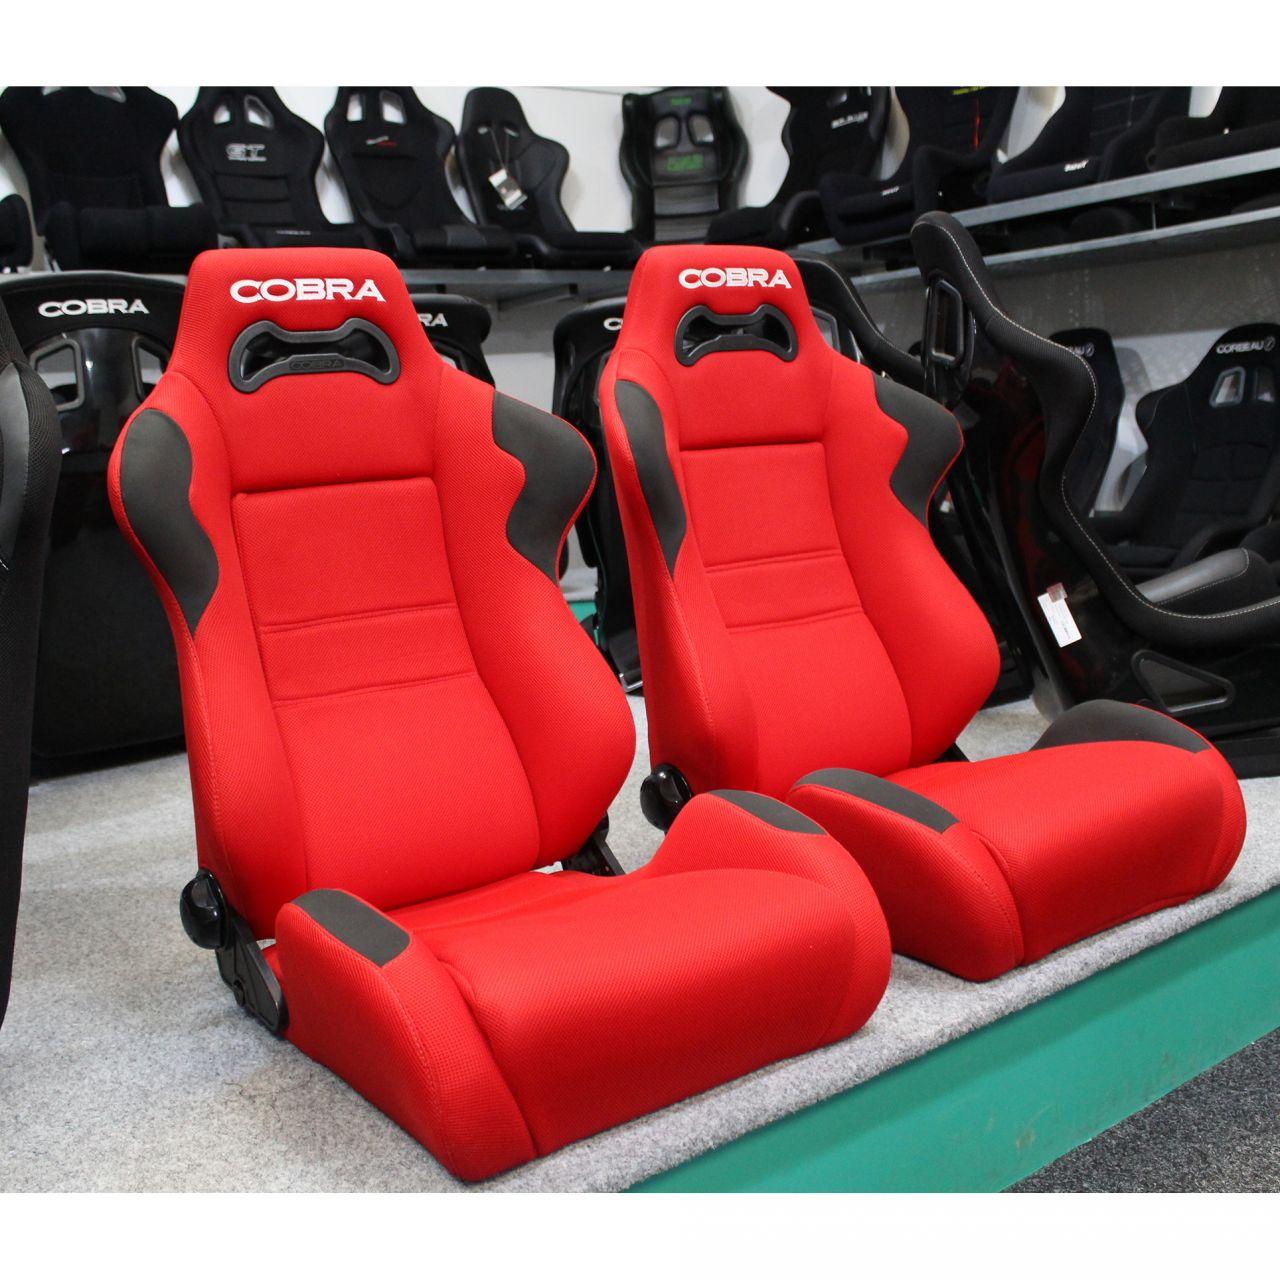 cobra daytona reclining sport seat  gsm sport seats -  cobra daytona reclining sport seat